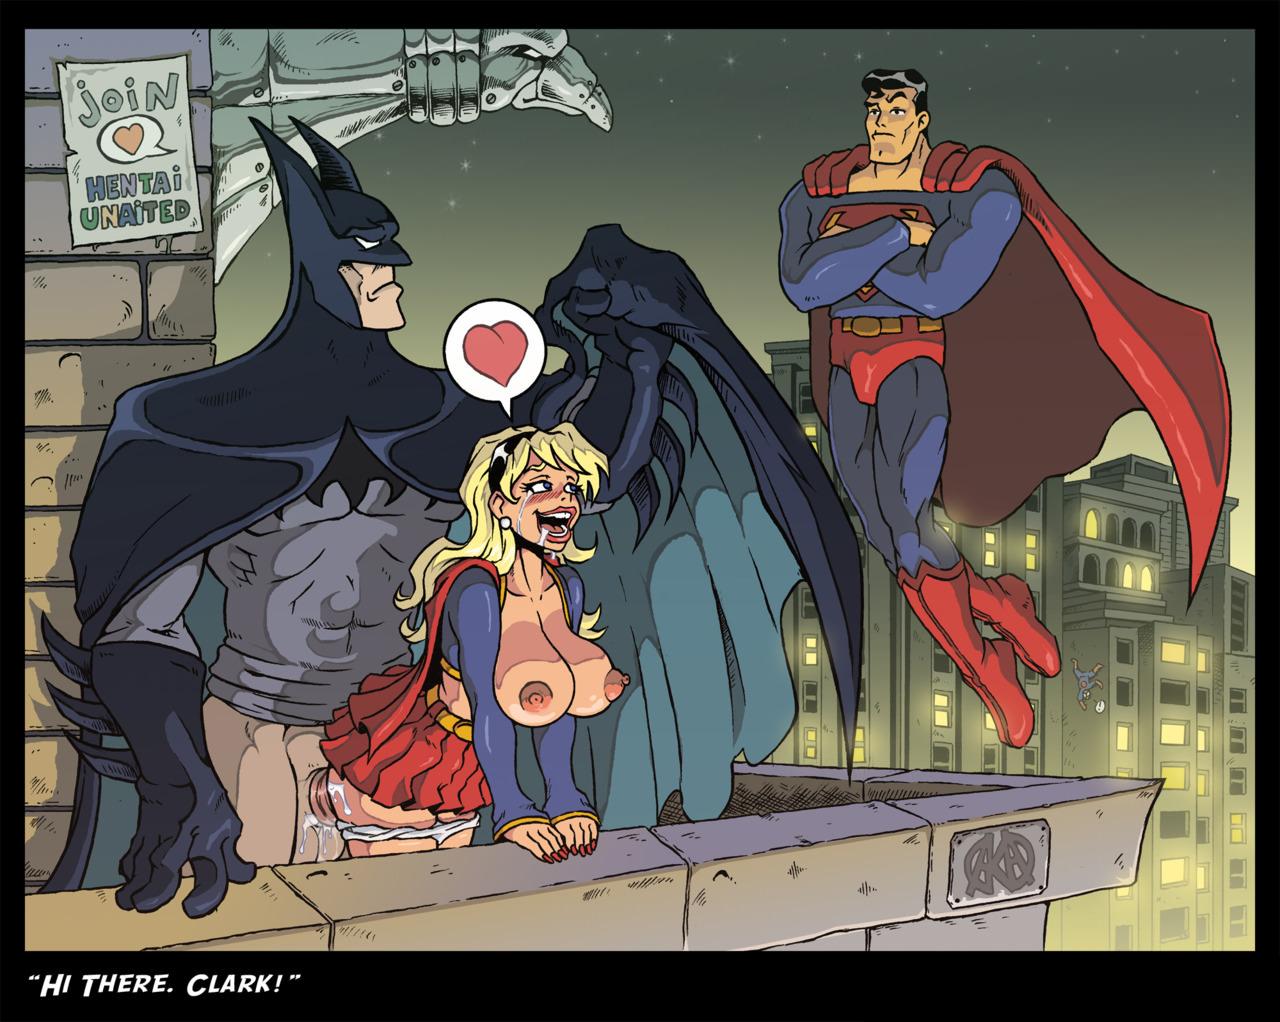 Batman Porno batman - cartoons, porn pictures online at world-hentai